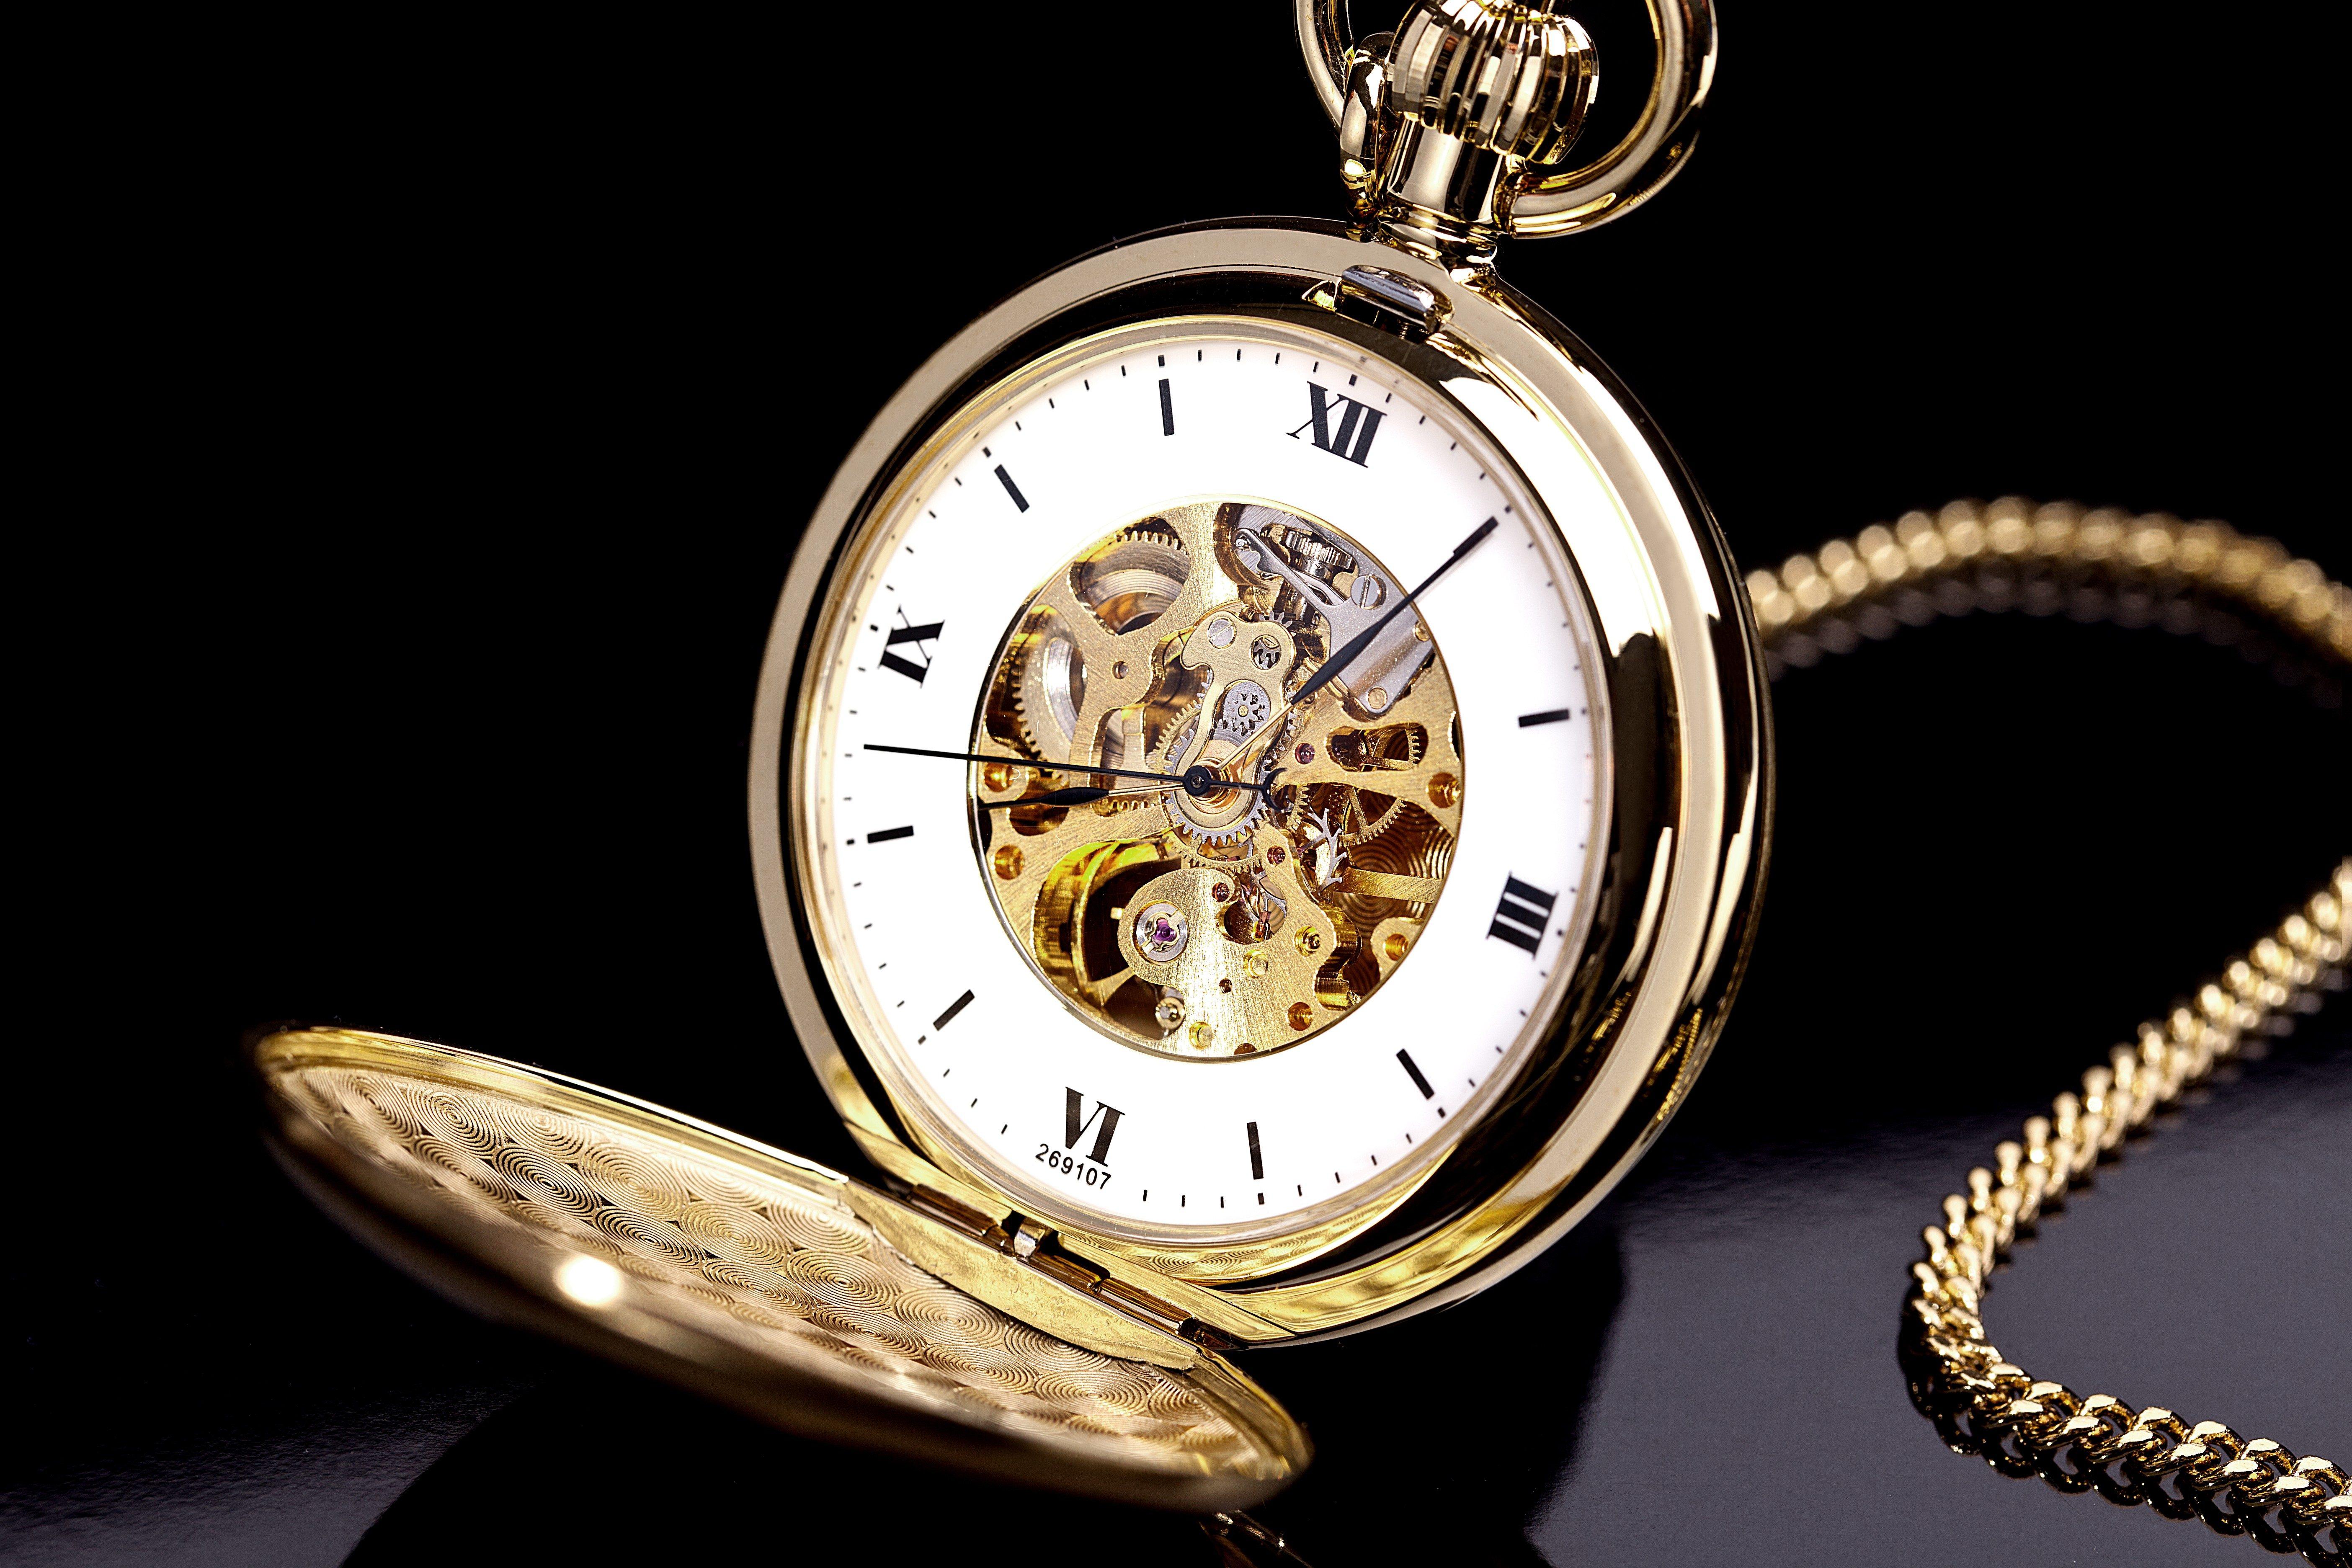 Gold pocket watch on a black background